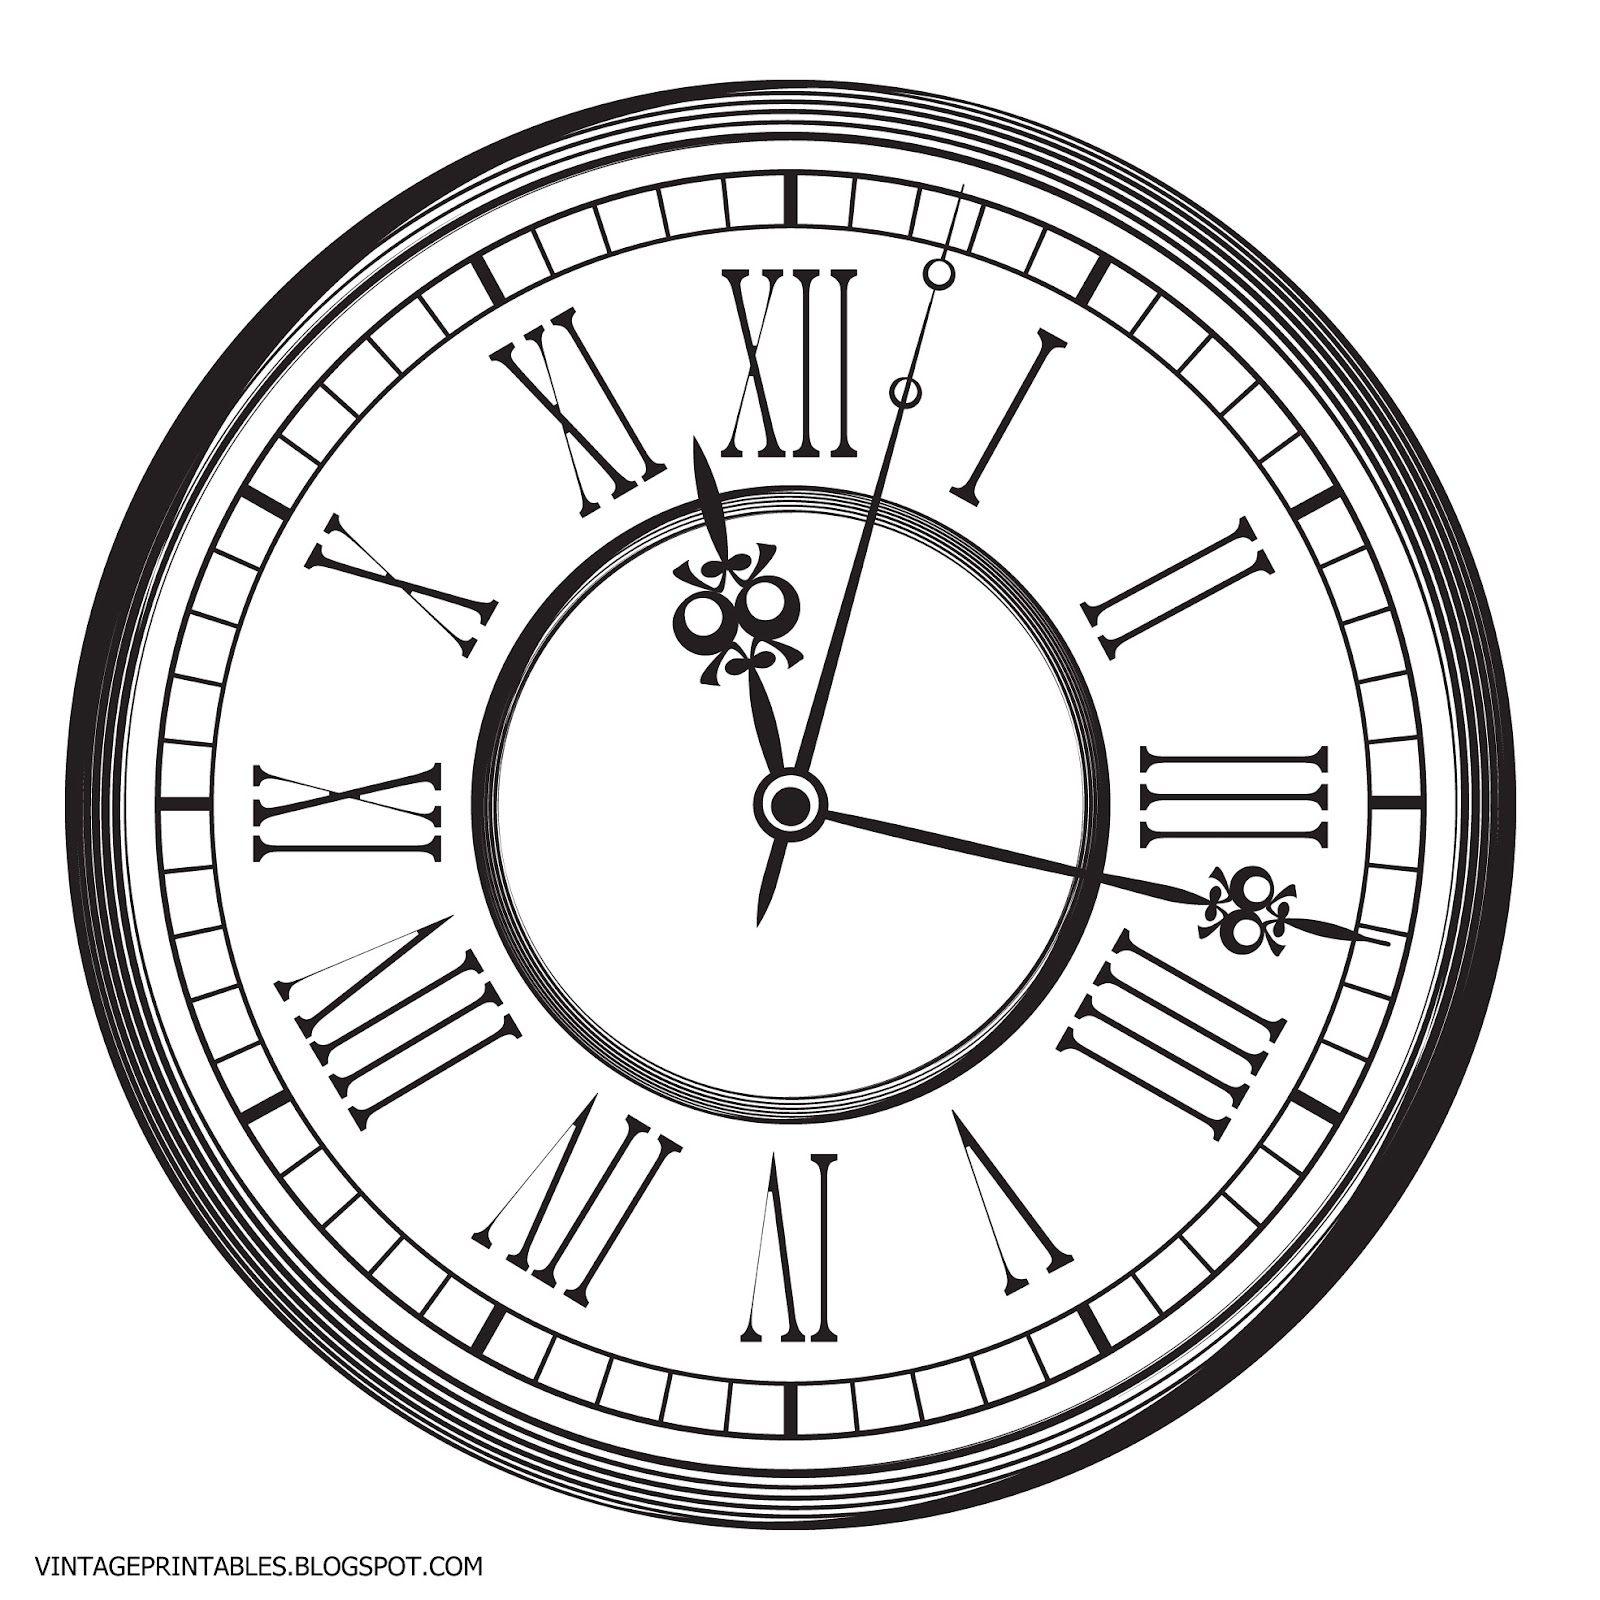 Free vintage clip art images: Old antique clock free clip.